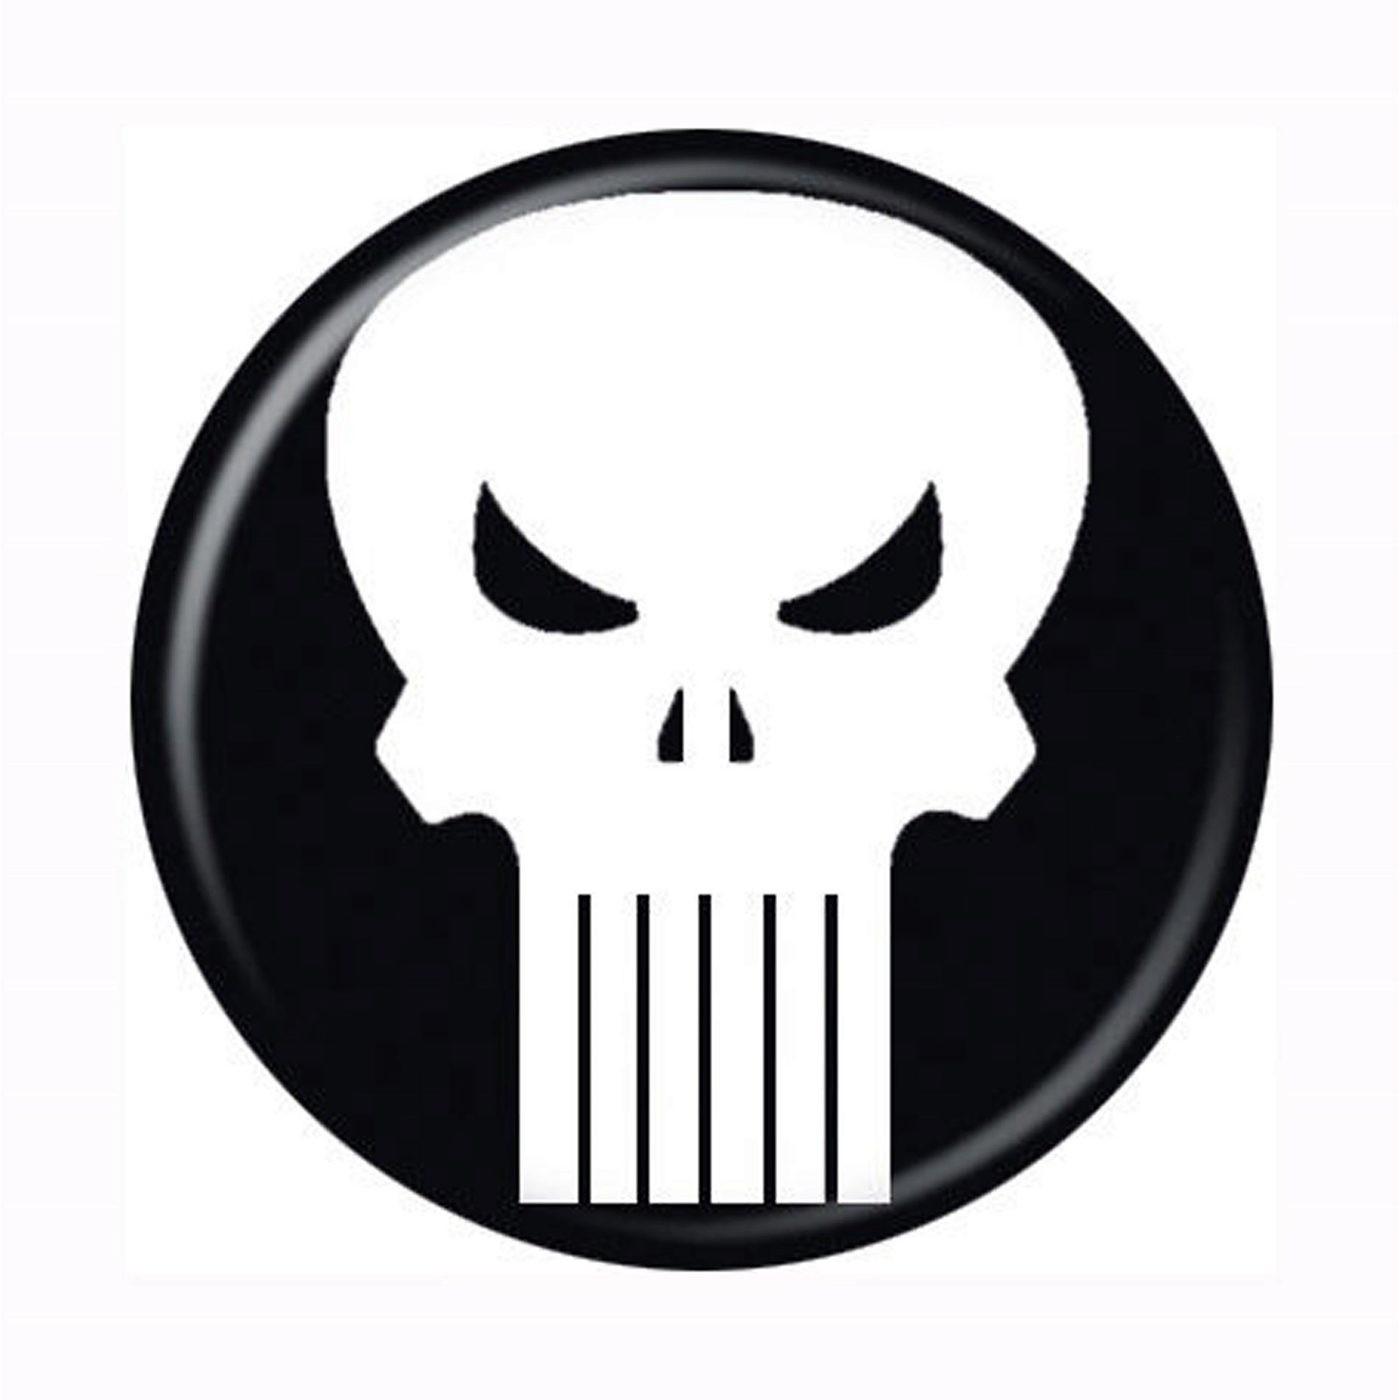 Punisher Skull Symbol Button